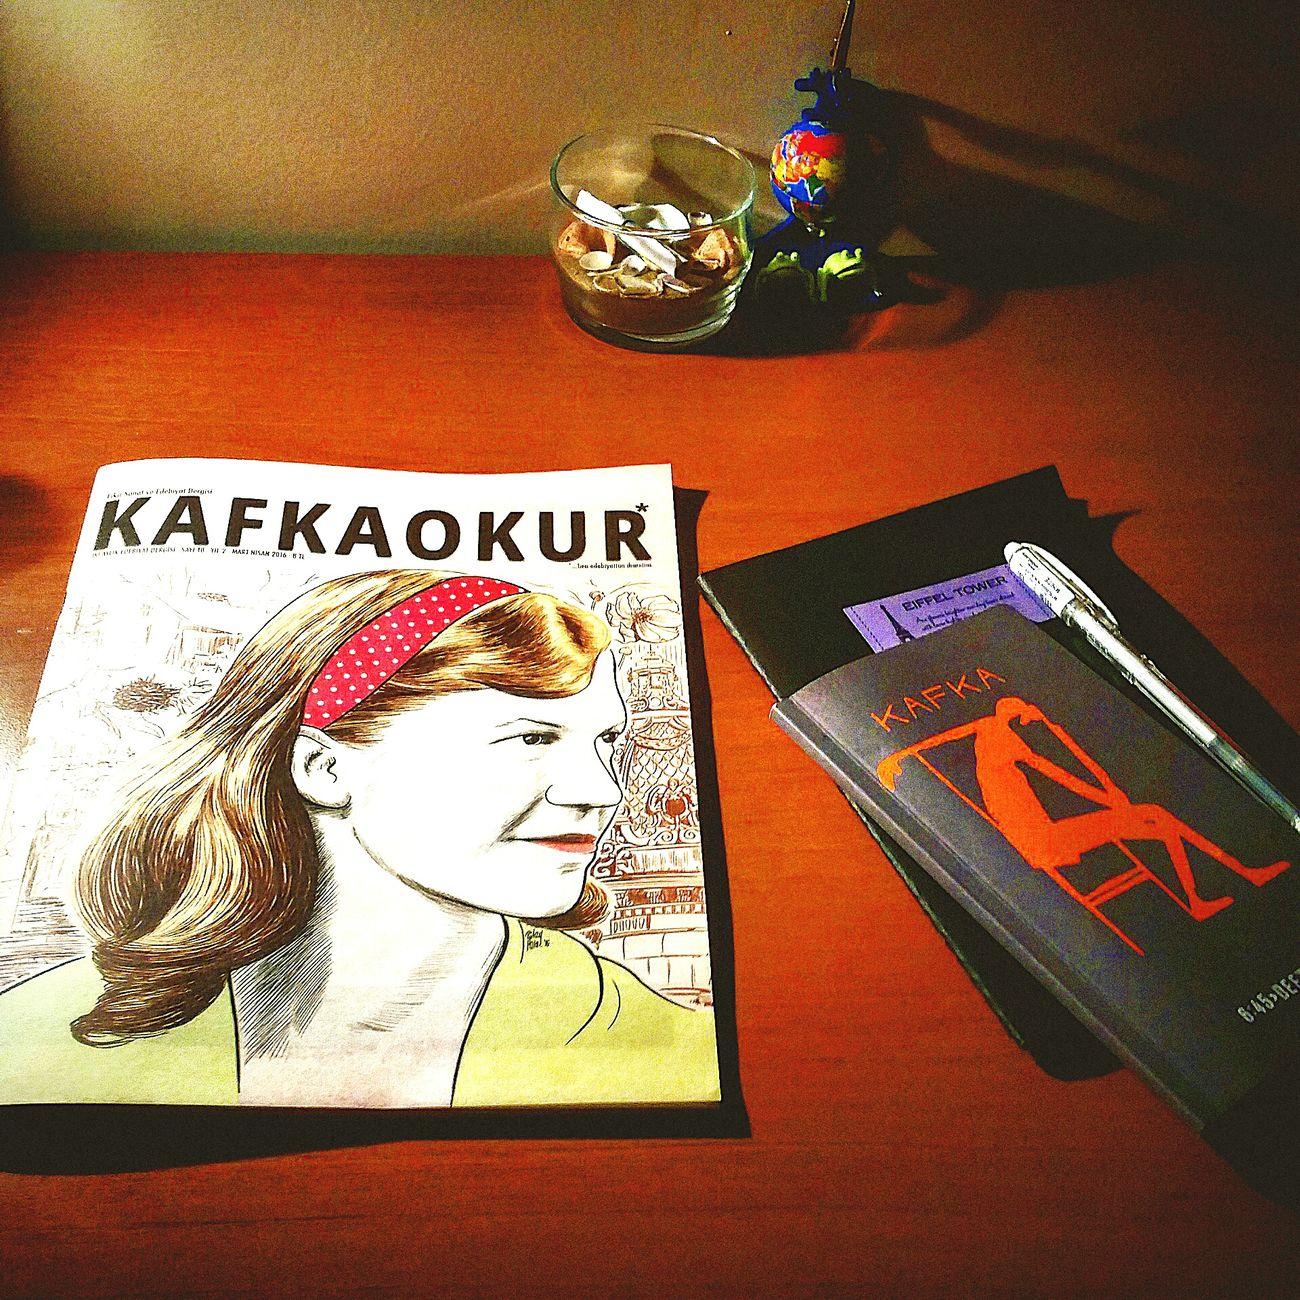 Kafkaokur Kafkaokurdergi Kafkaokuredebiyat Kafkaokurfikir Kafkaokursanat Kafkaokurdergisi